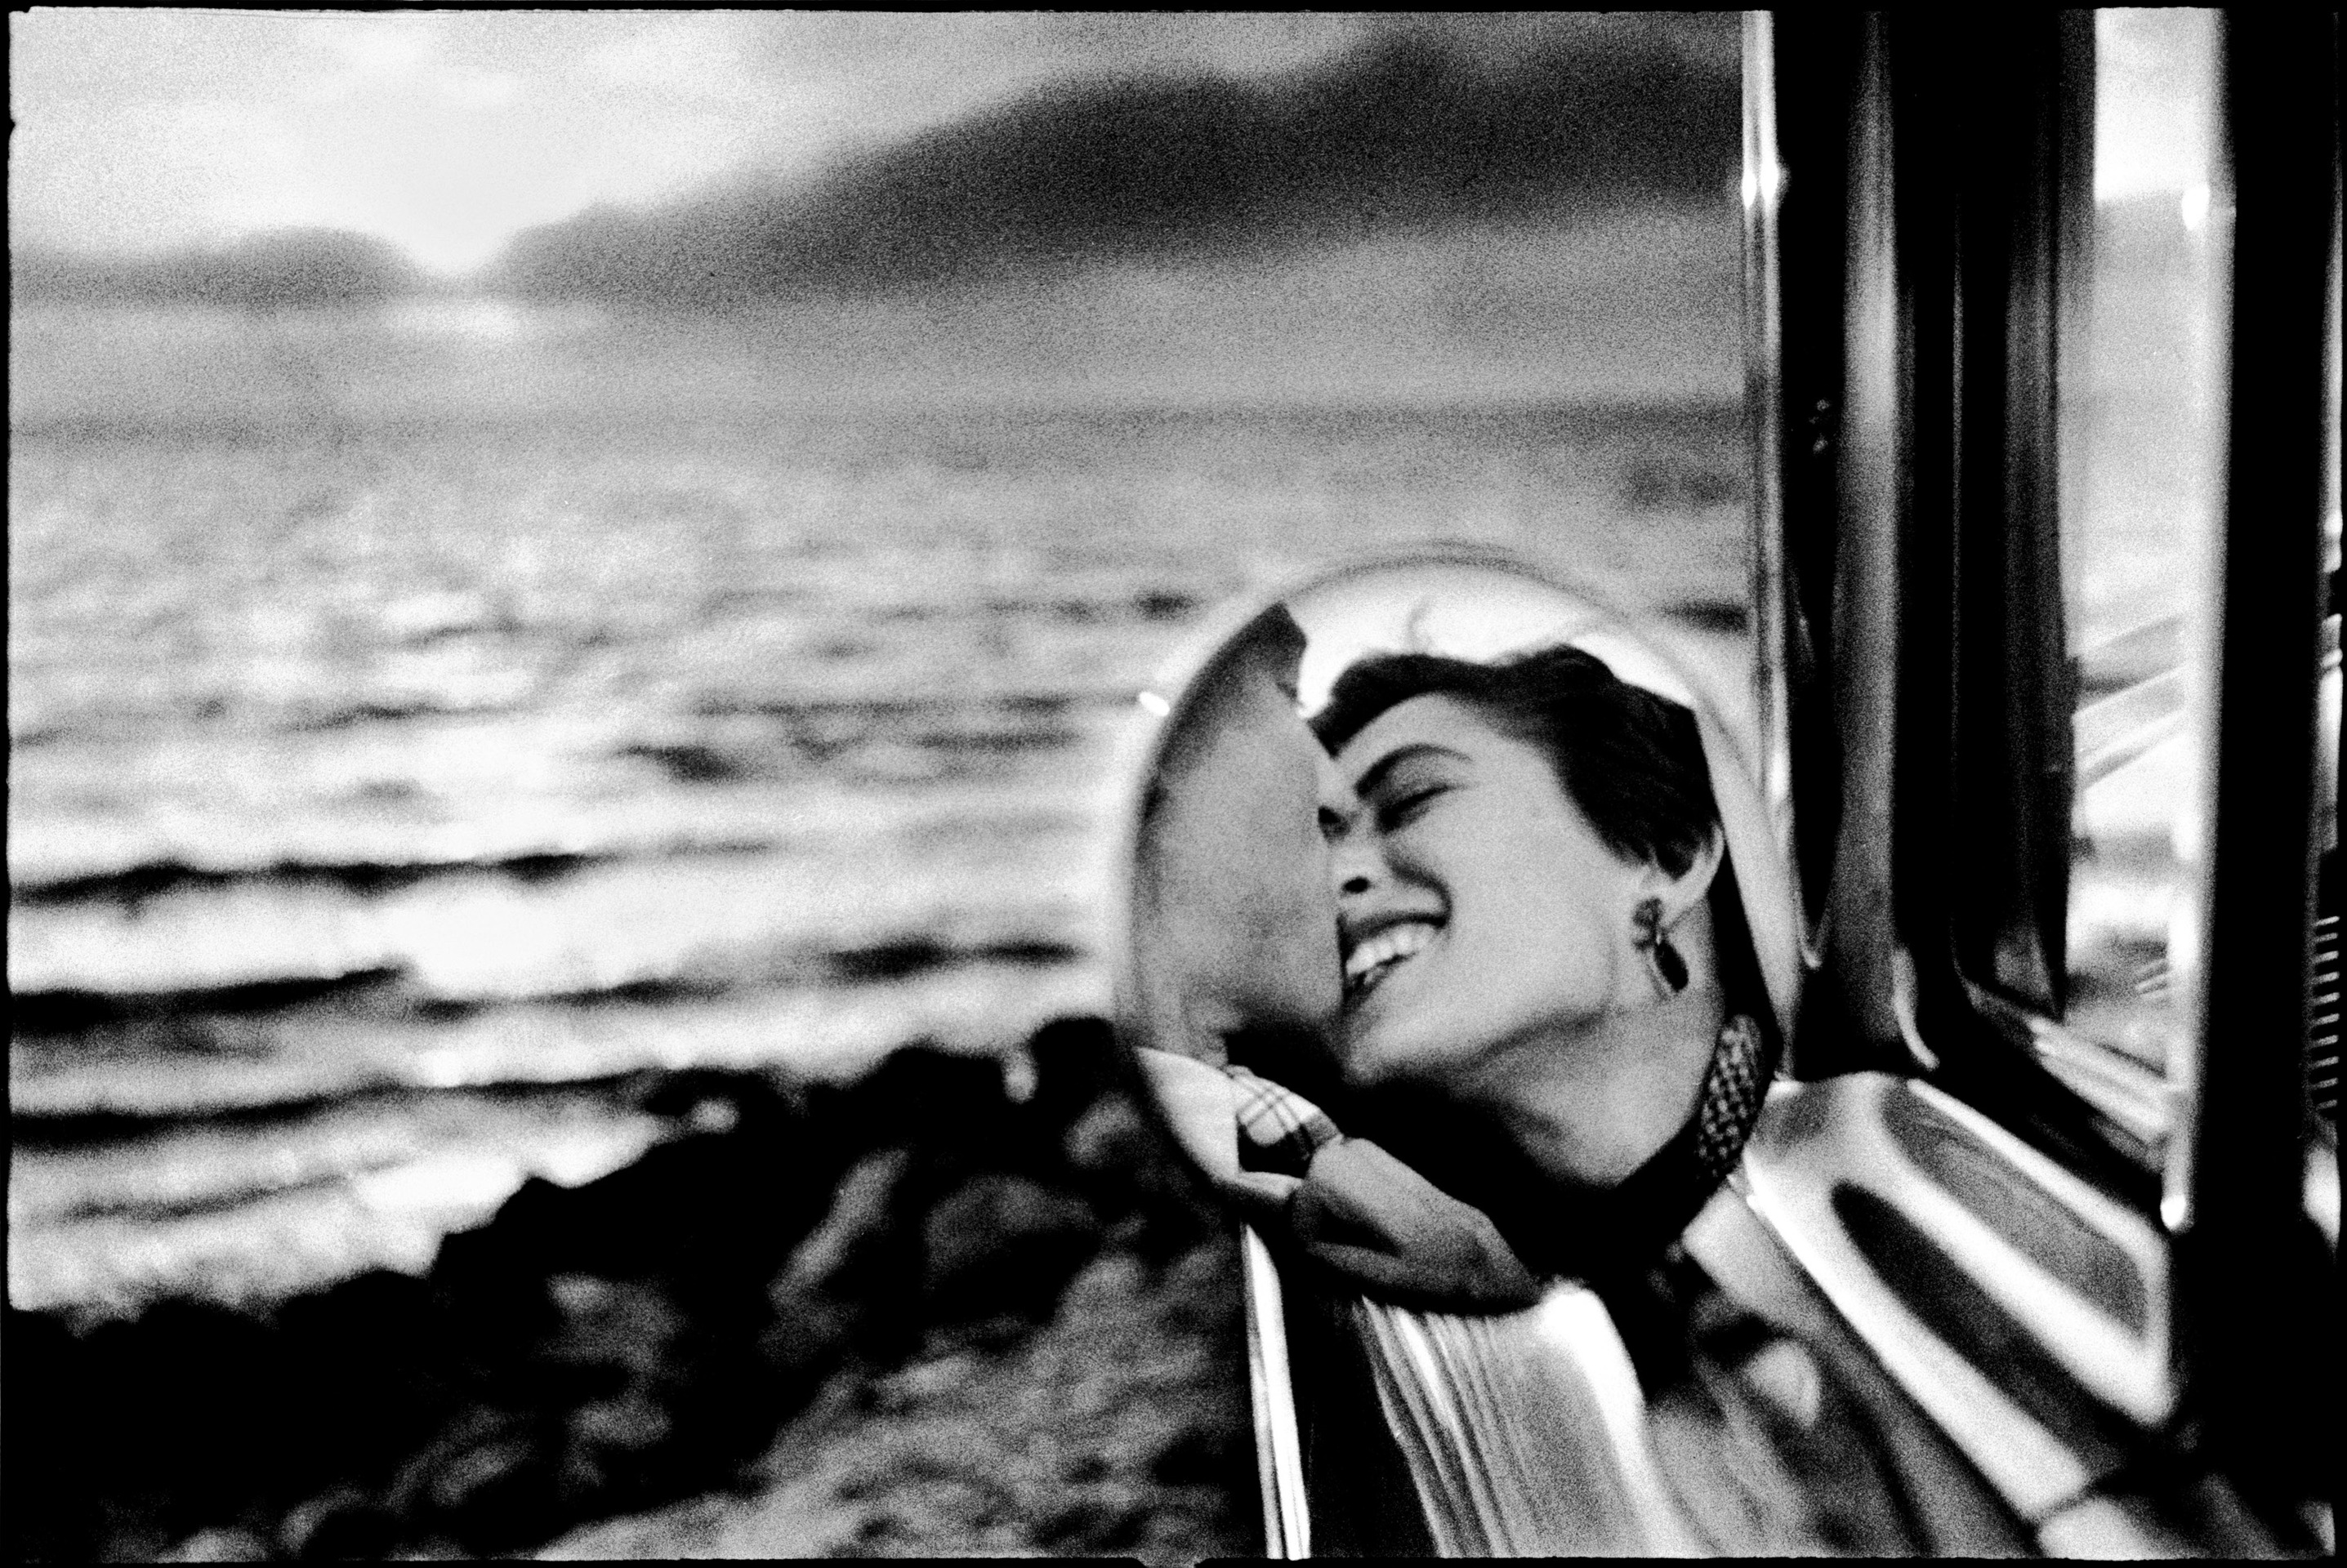 USA. California. 1955.